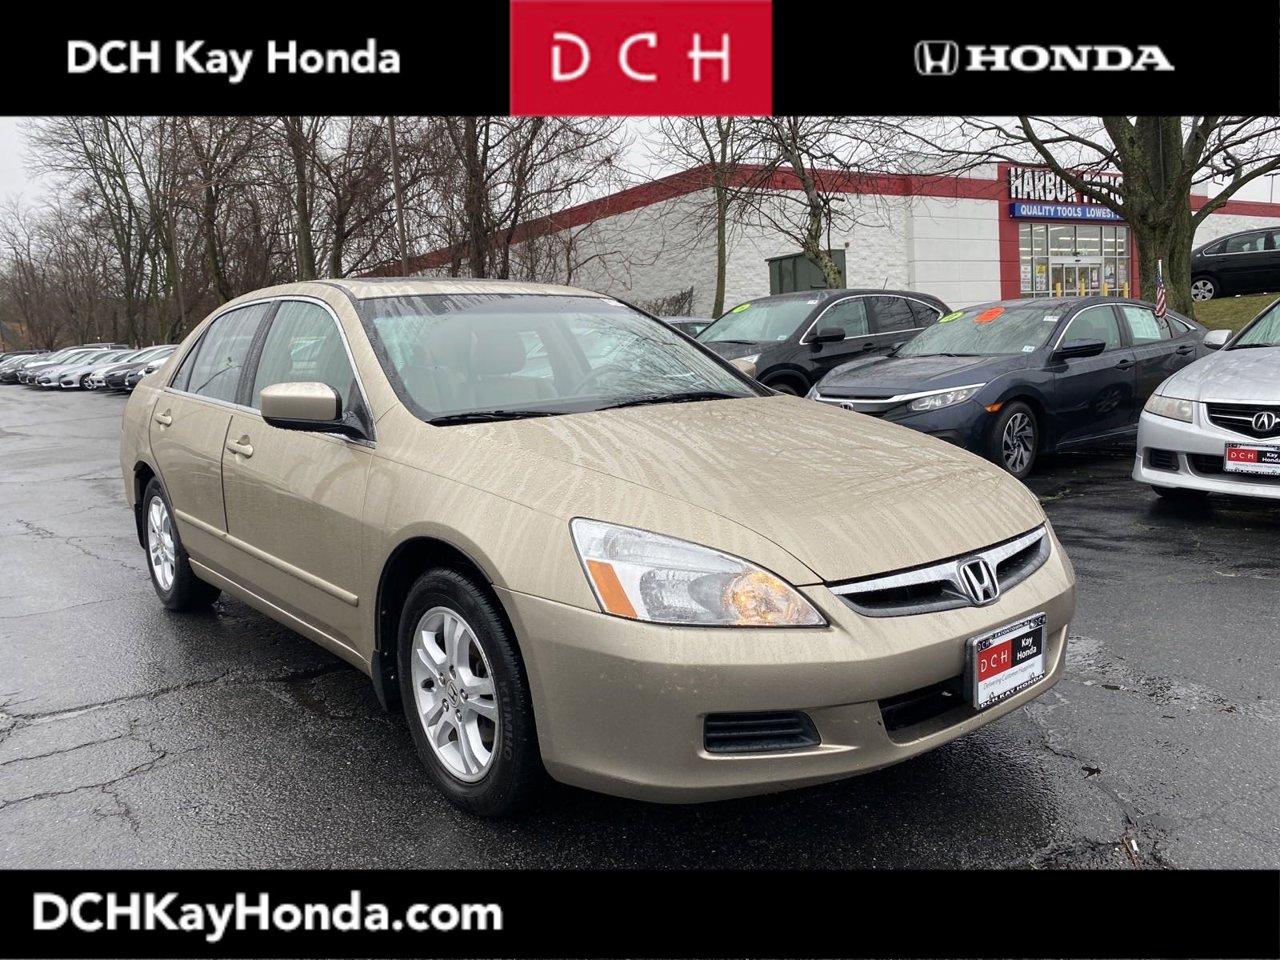 Used 2007 Honda Accord Sedan in Eatontown, NJ